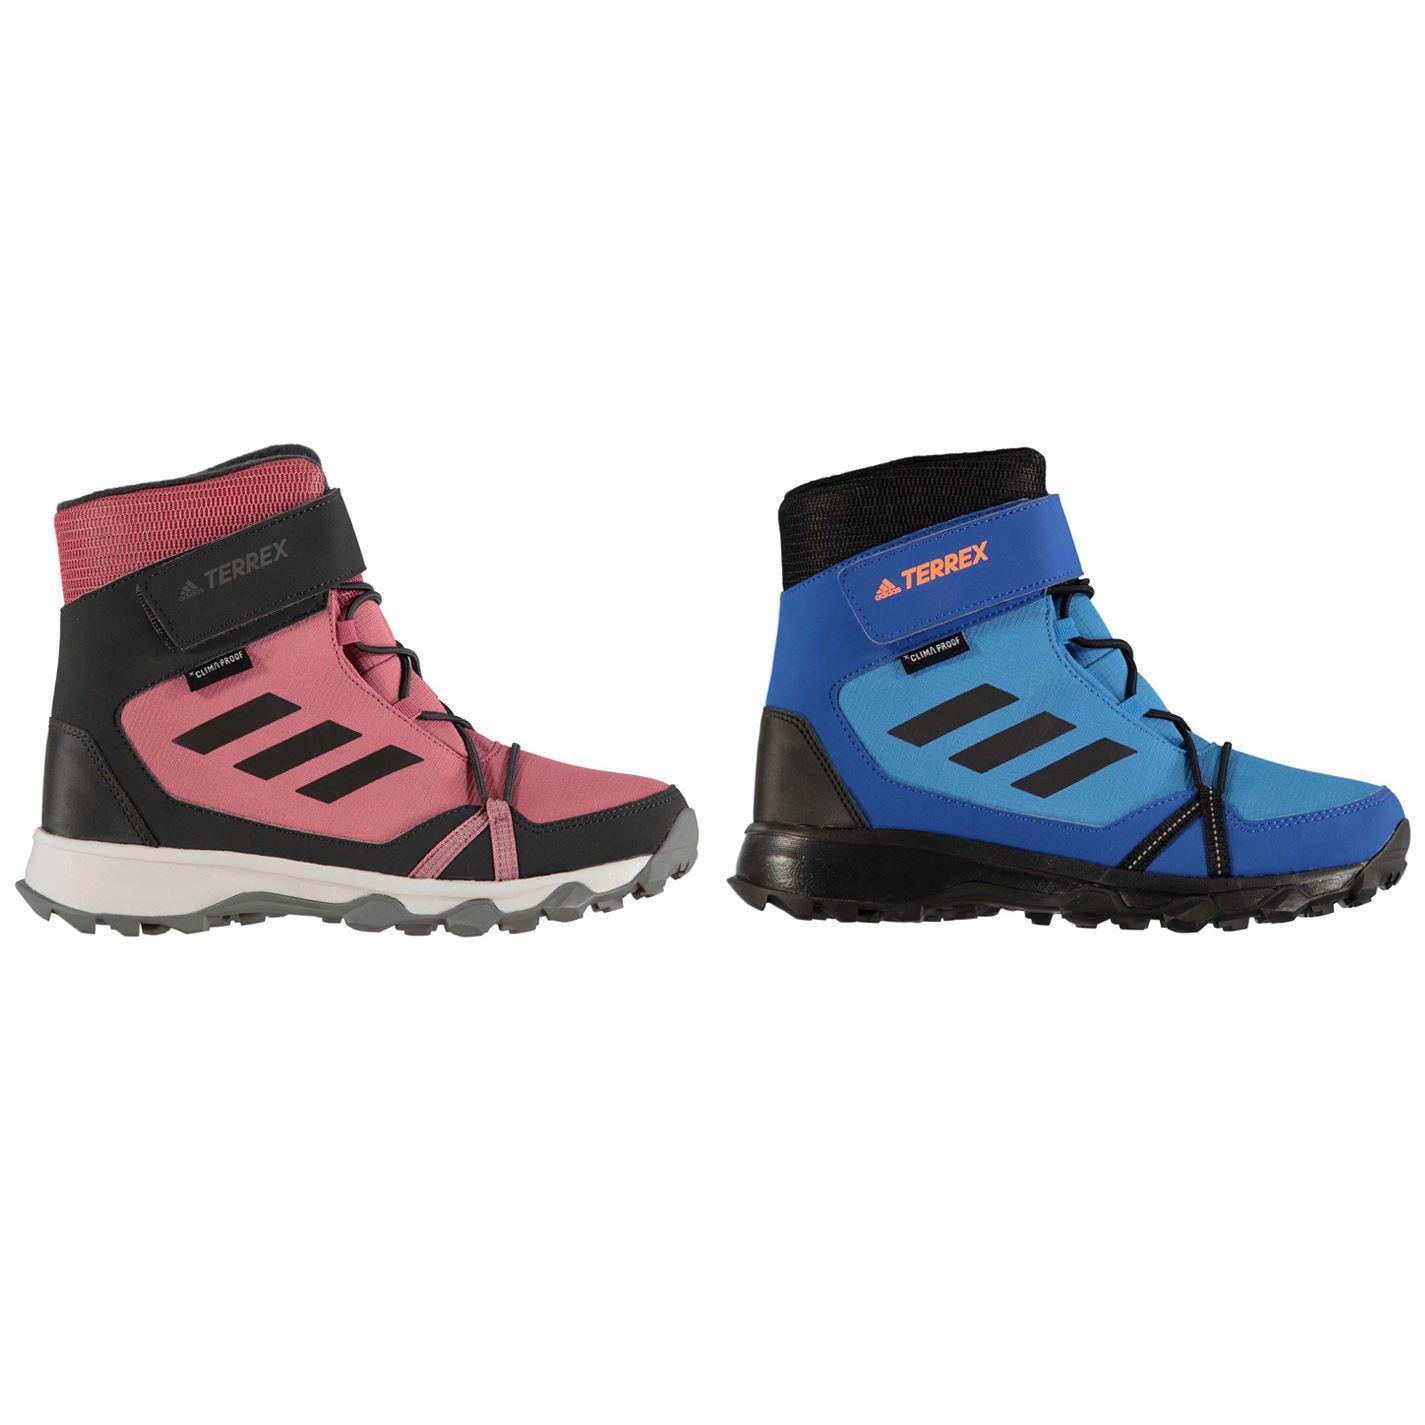 san francisco a5cdd 92cb4 adidas Terrex Junior Boys Snow Boots Boys Insulated Winter Footwear